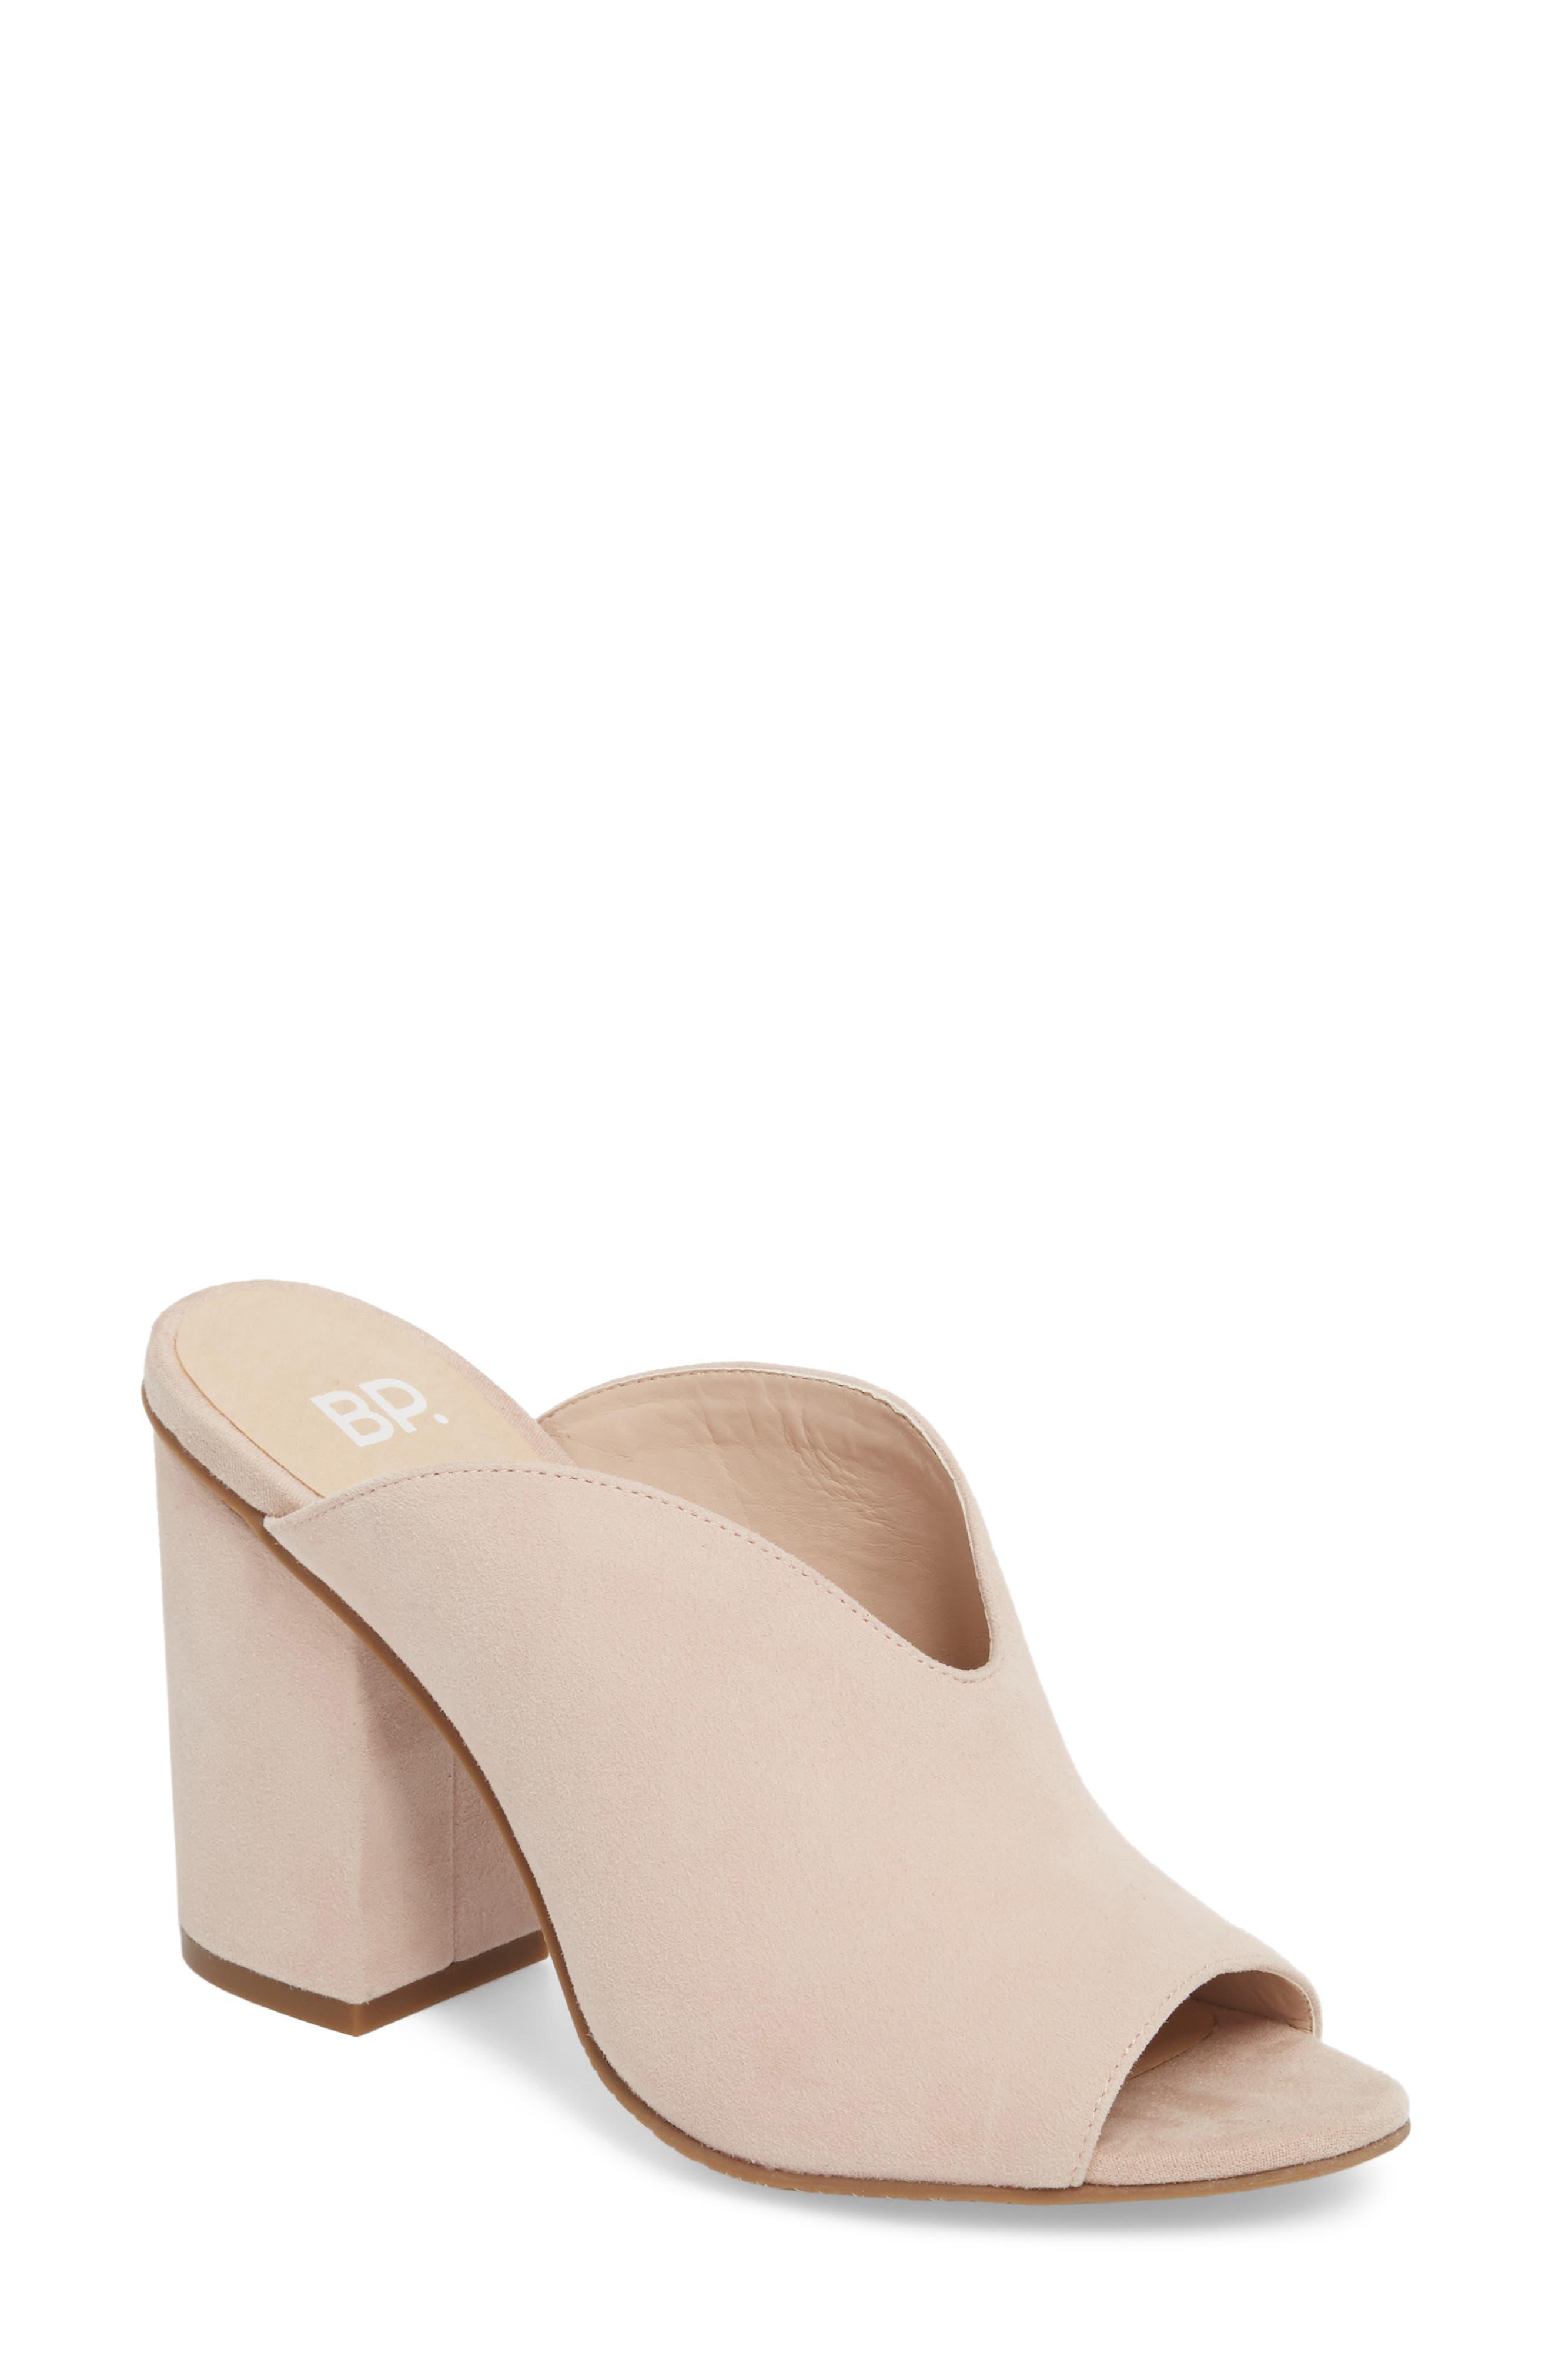 Tonya Open Toe Mule,                         Main,                         color, Blush Suede